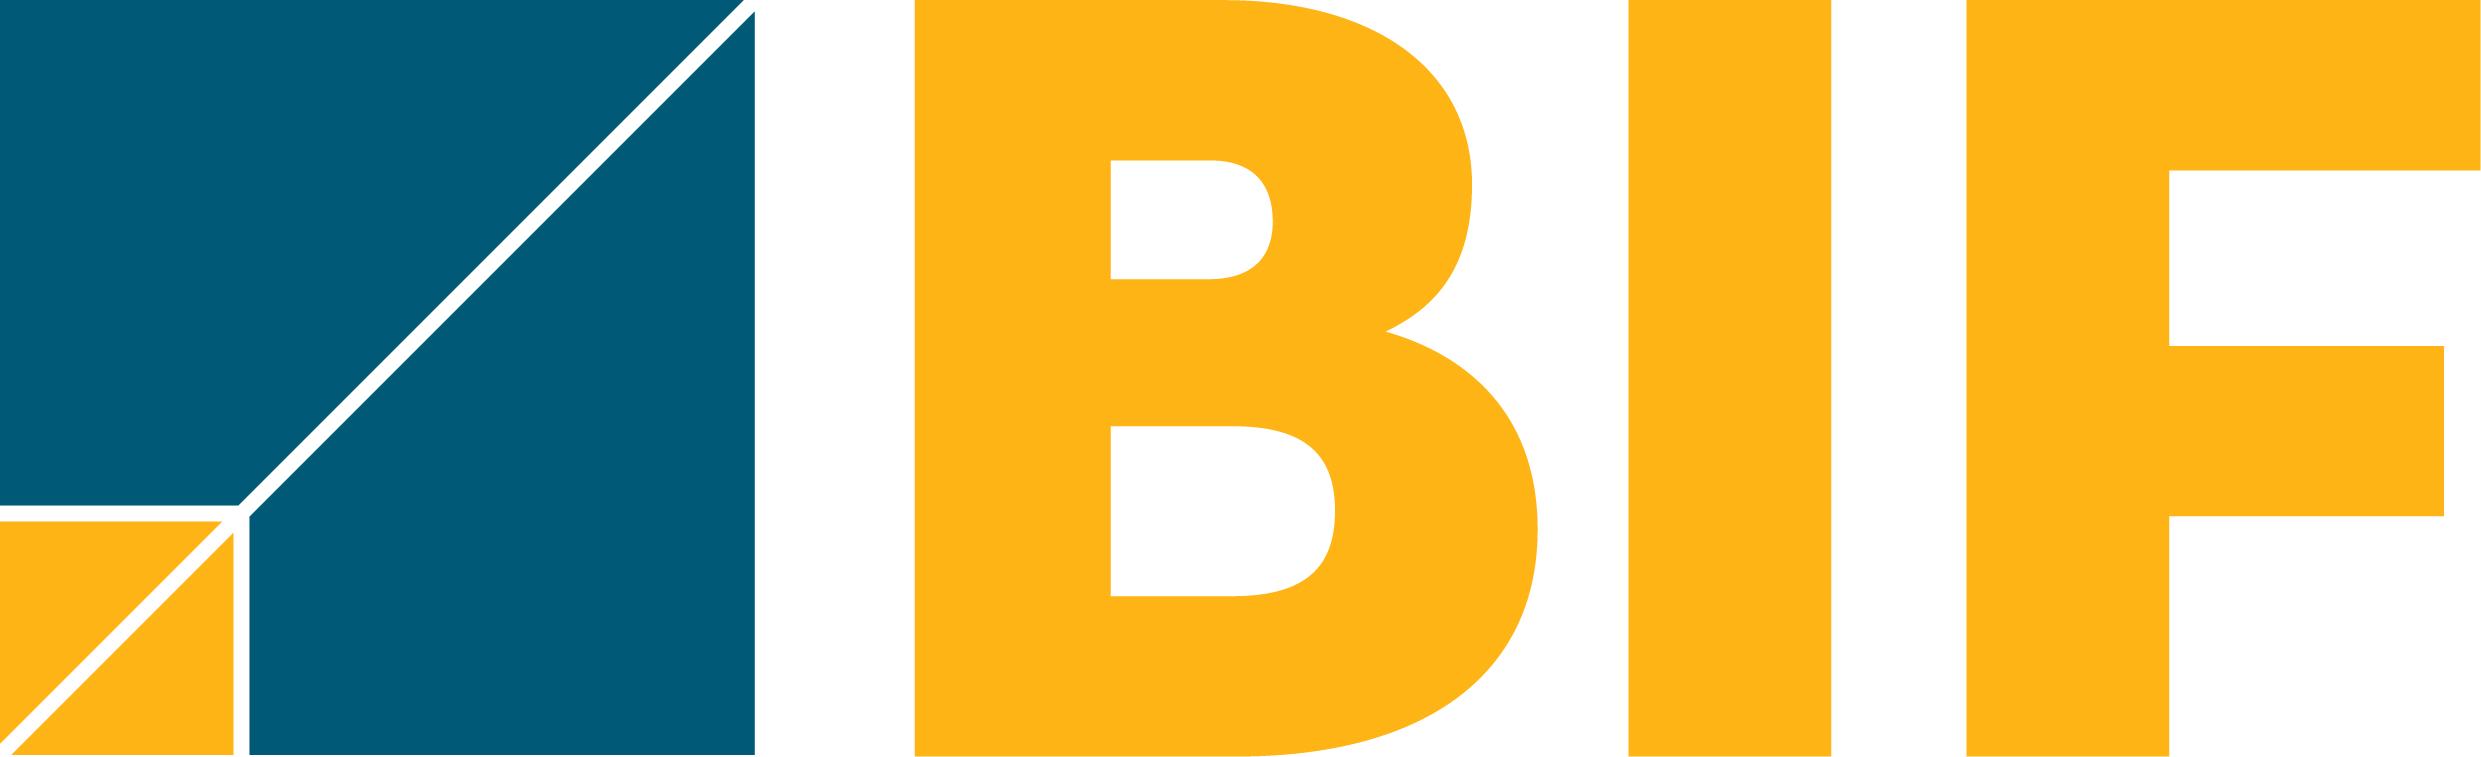 bif-small-logo.jpg